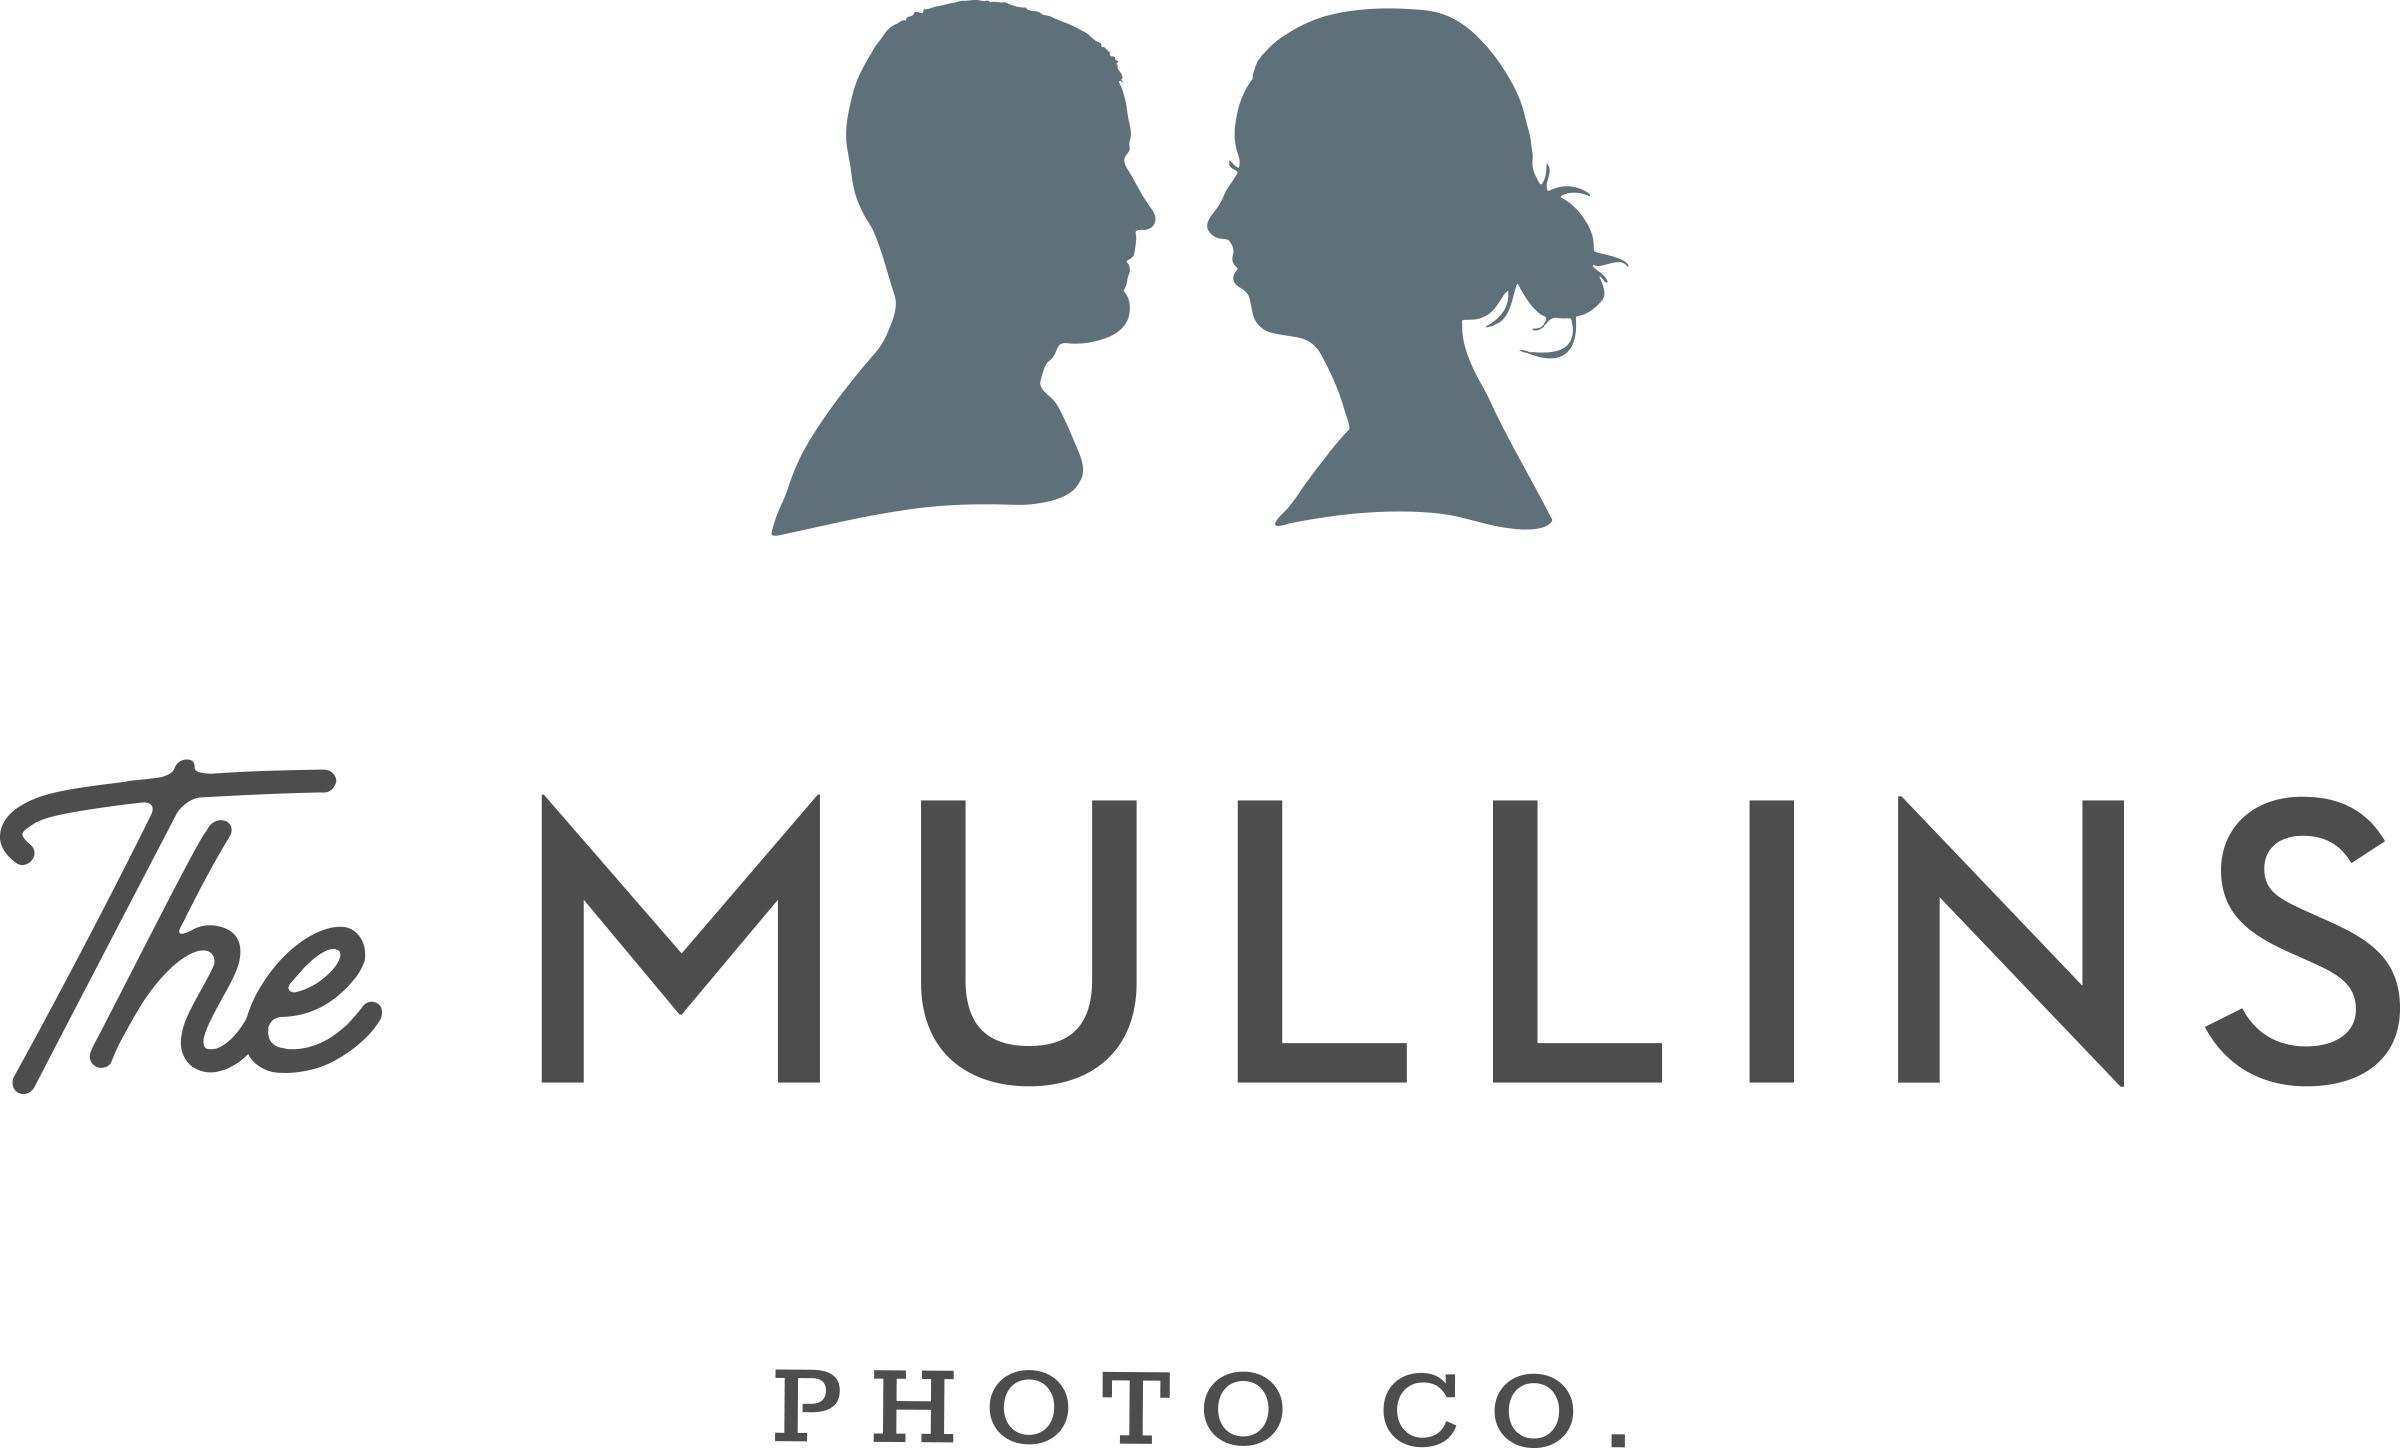 Mullins Photo Co.